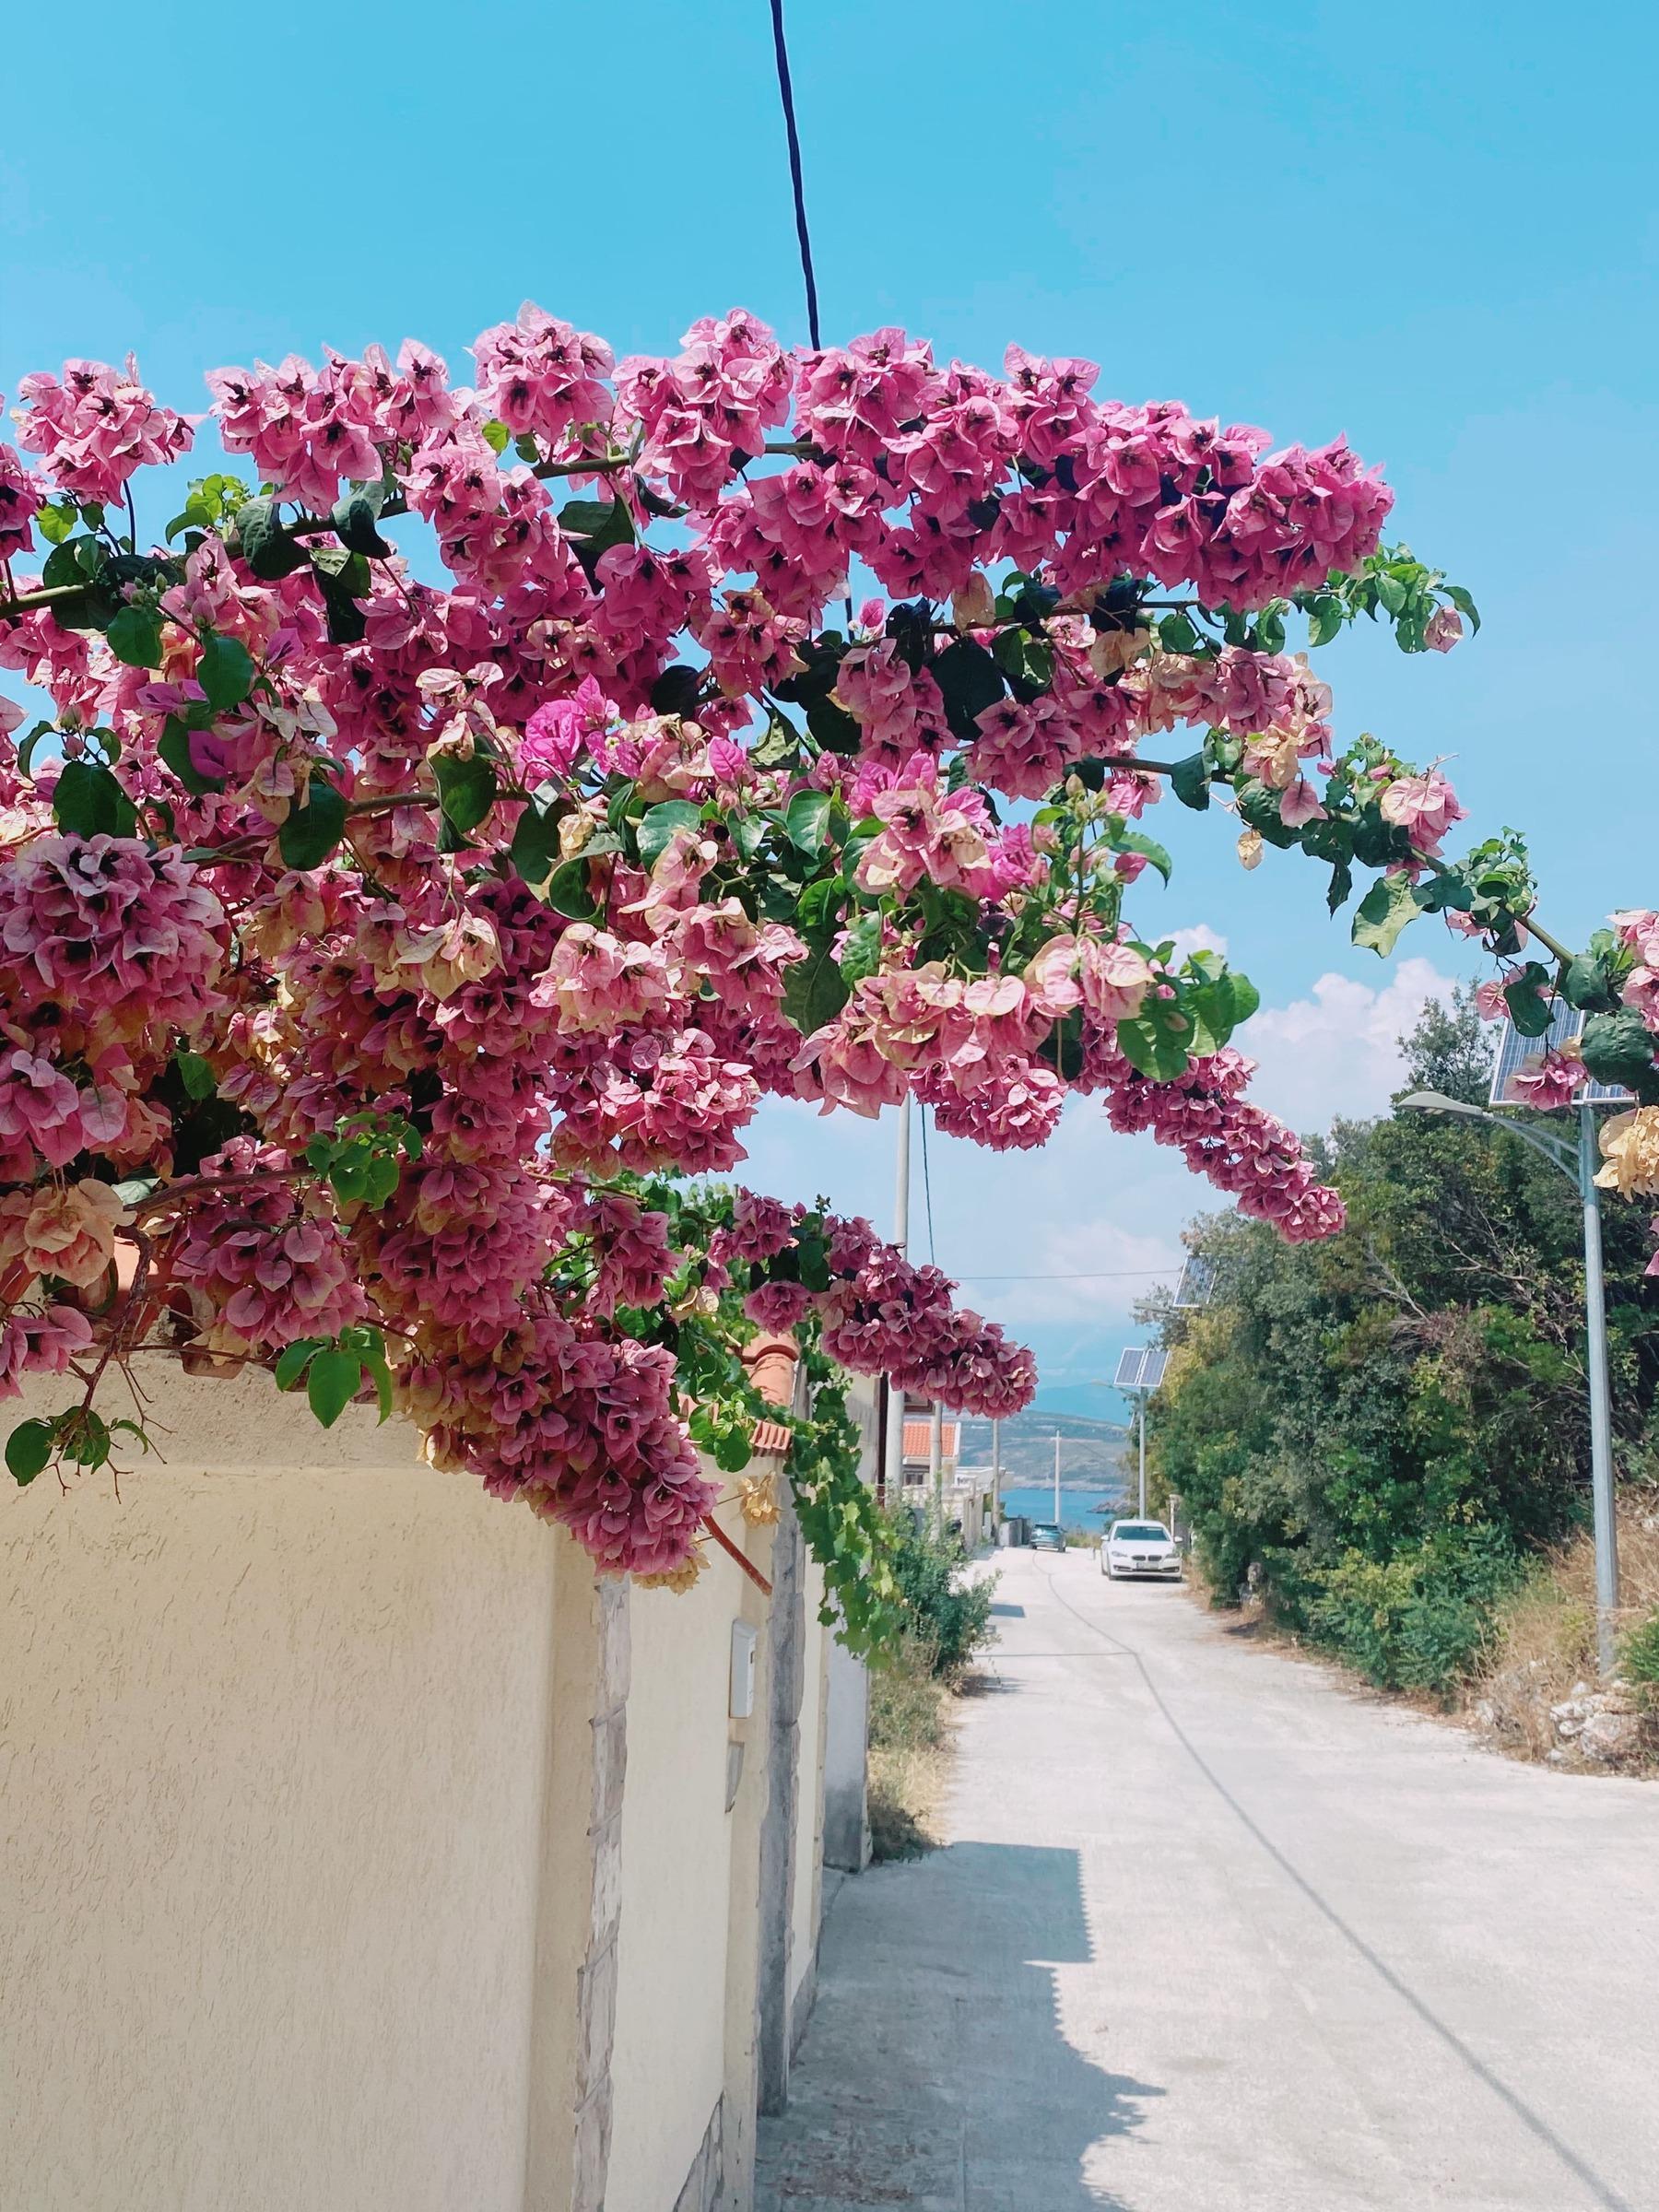 bigovo, montenegro